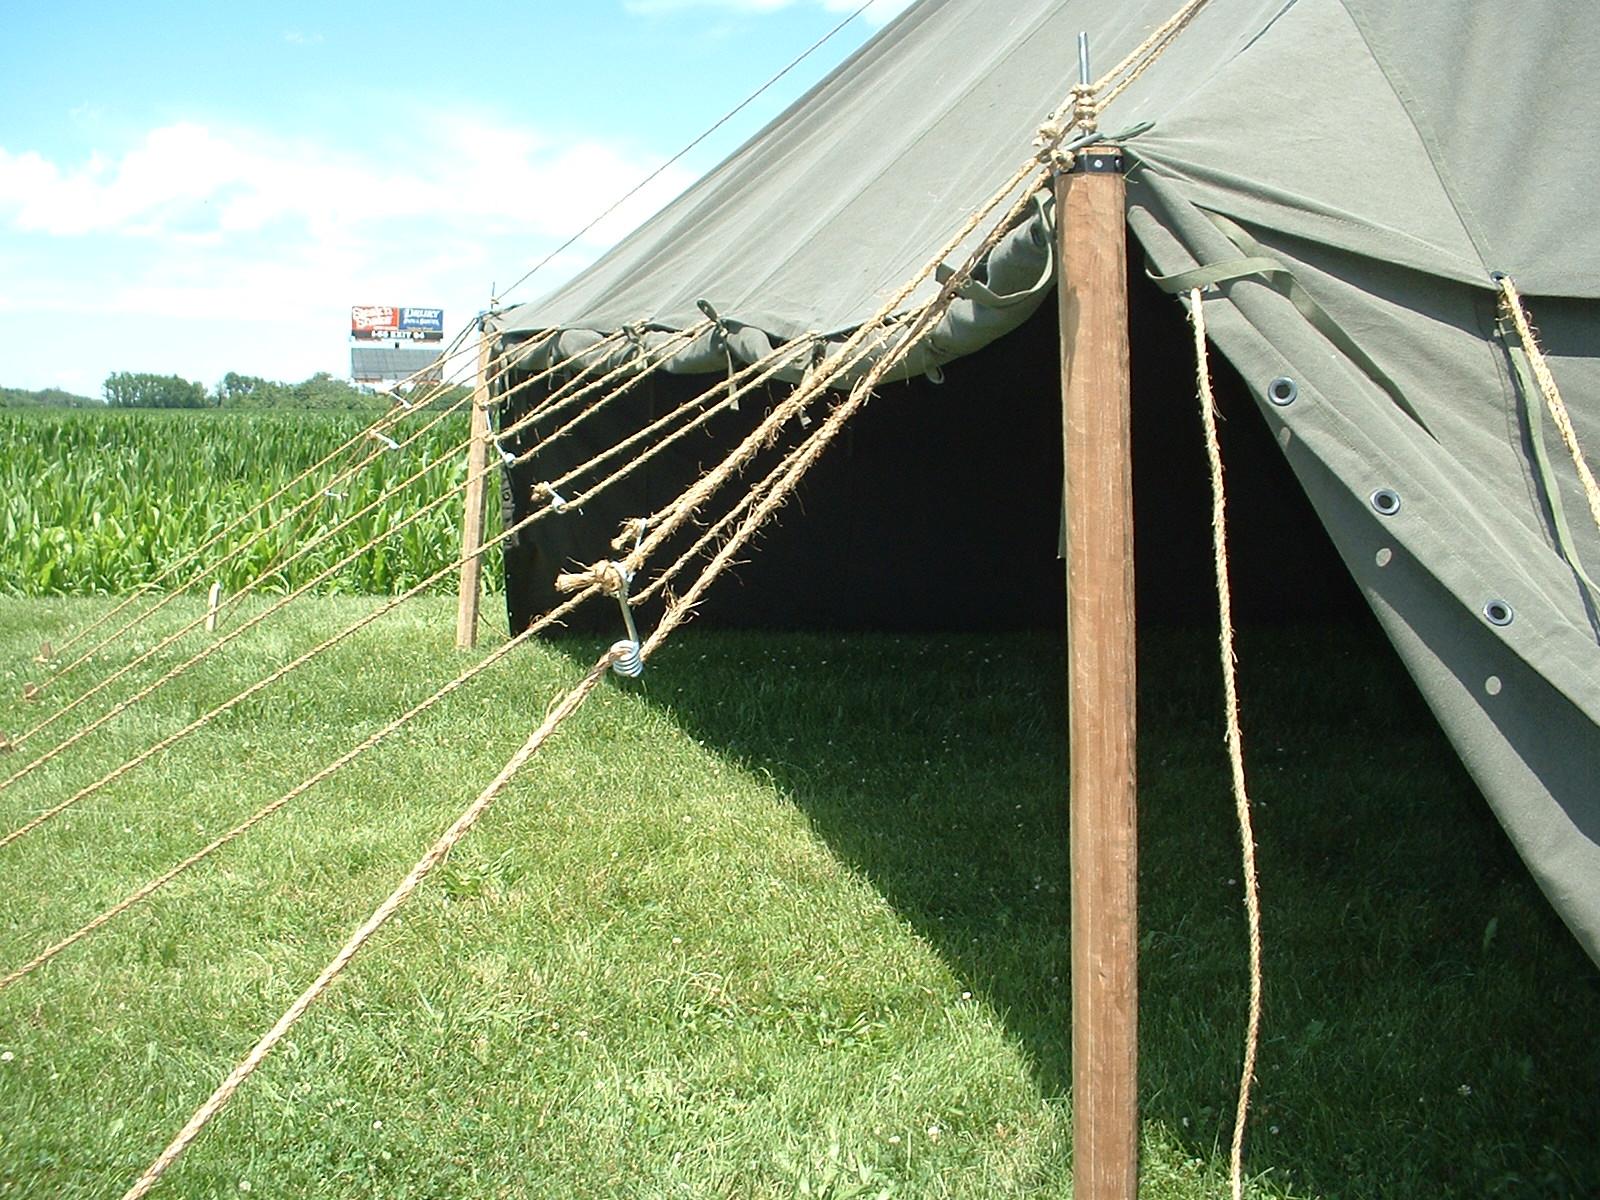 1934 Pyramidal Tent from Armbruster & 1934 Pyramidal Tent from Armbruster | Armbruster Tent Maker